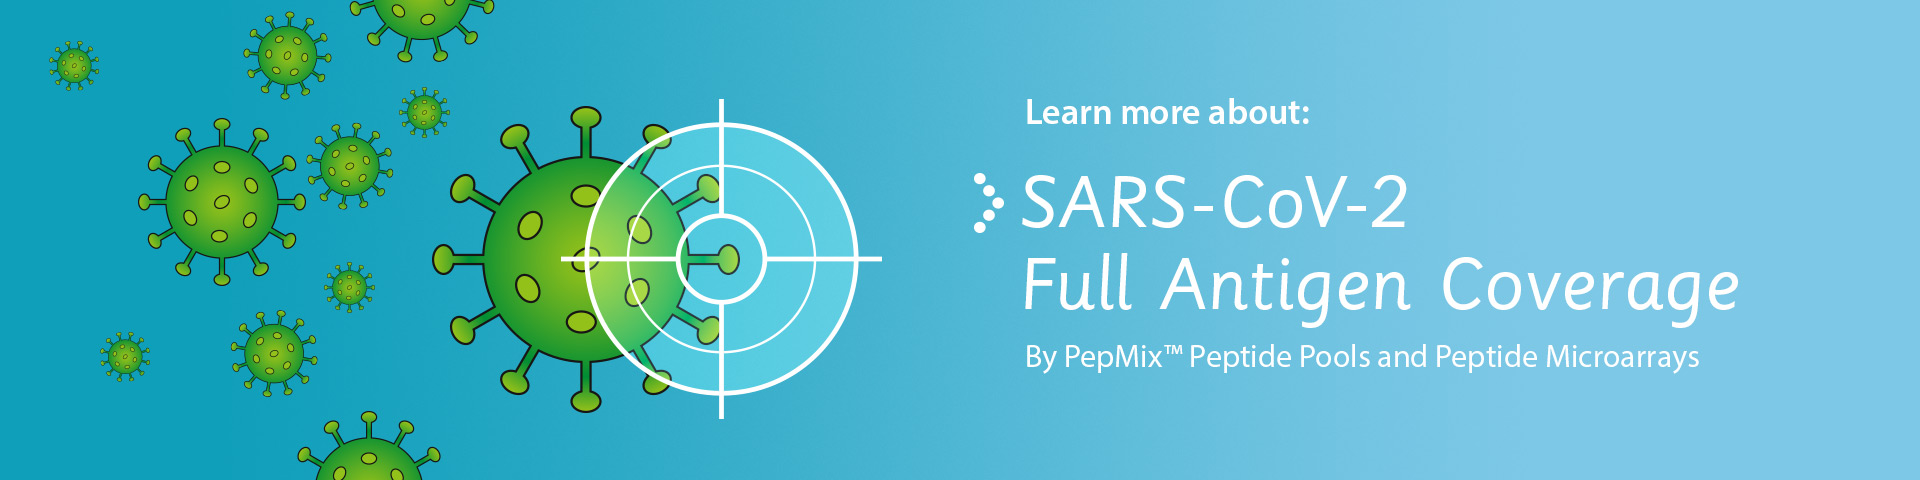 SARS-CoV-2 Full Antigen Coverage